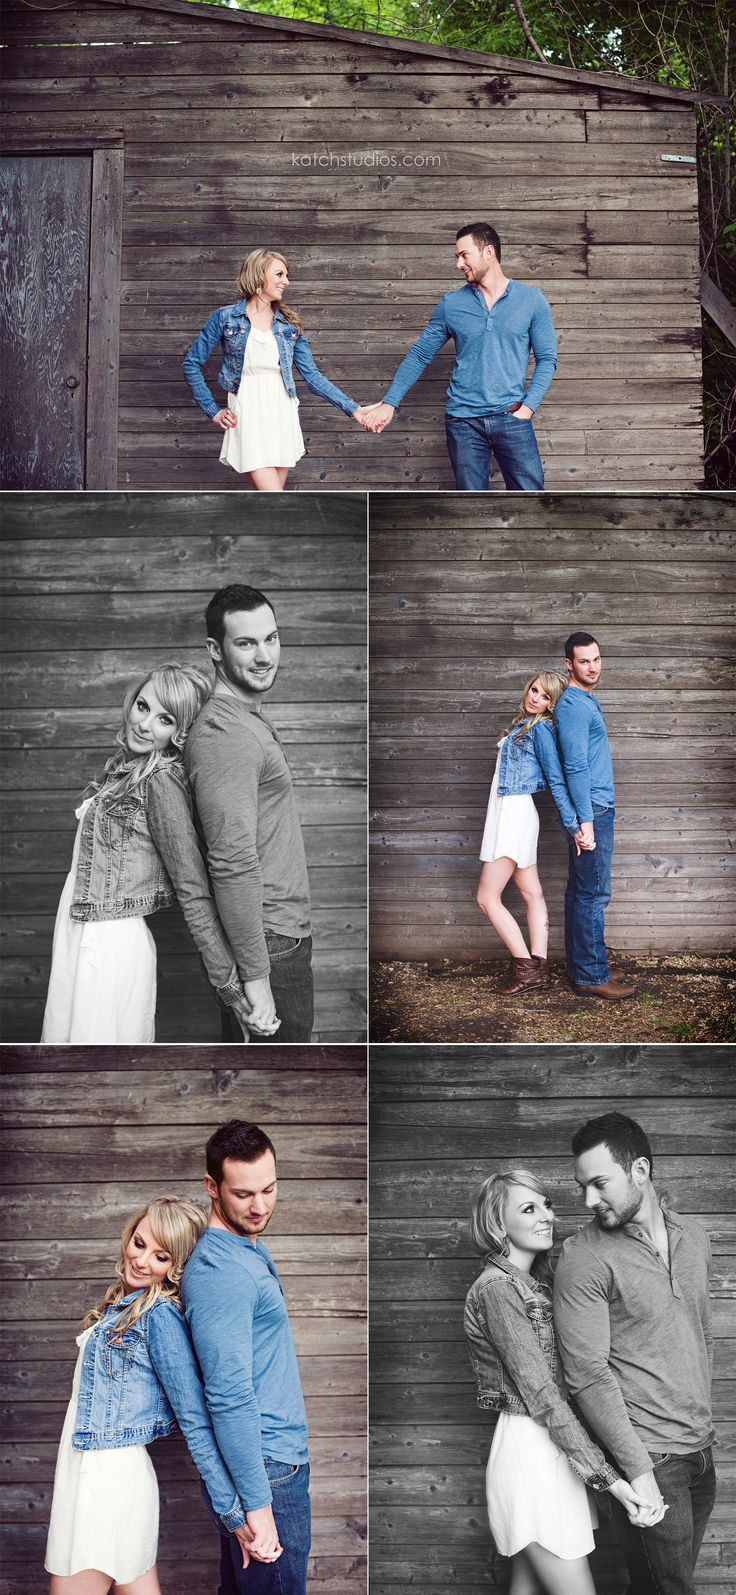 Many options from 1 basic pose engagement posing